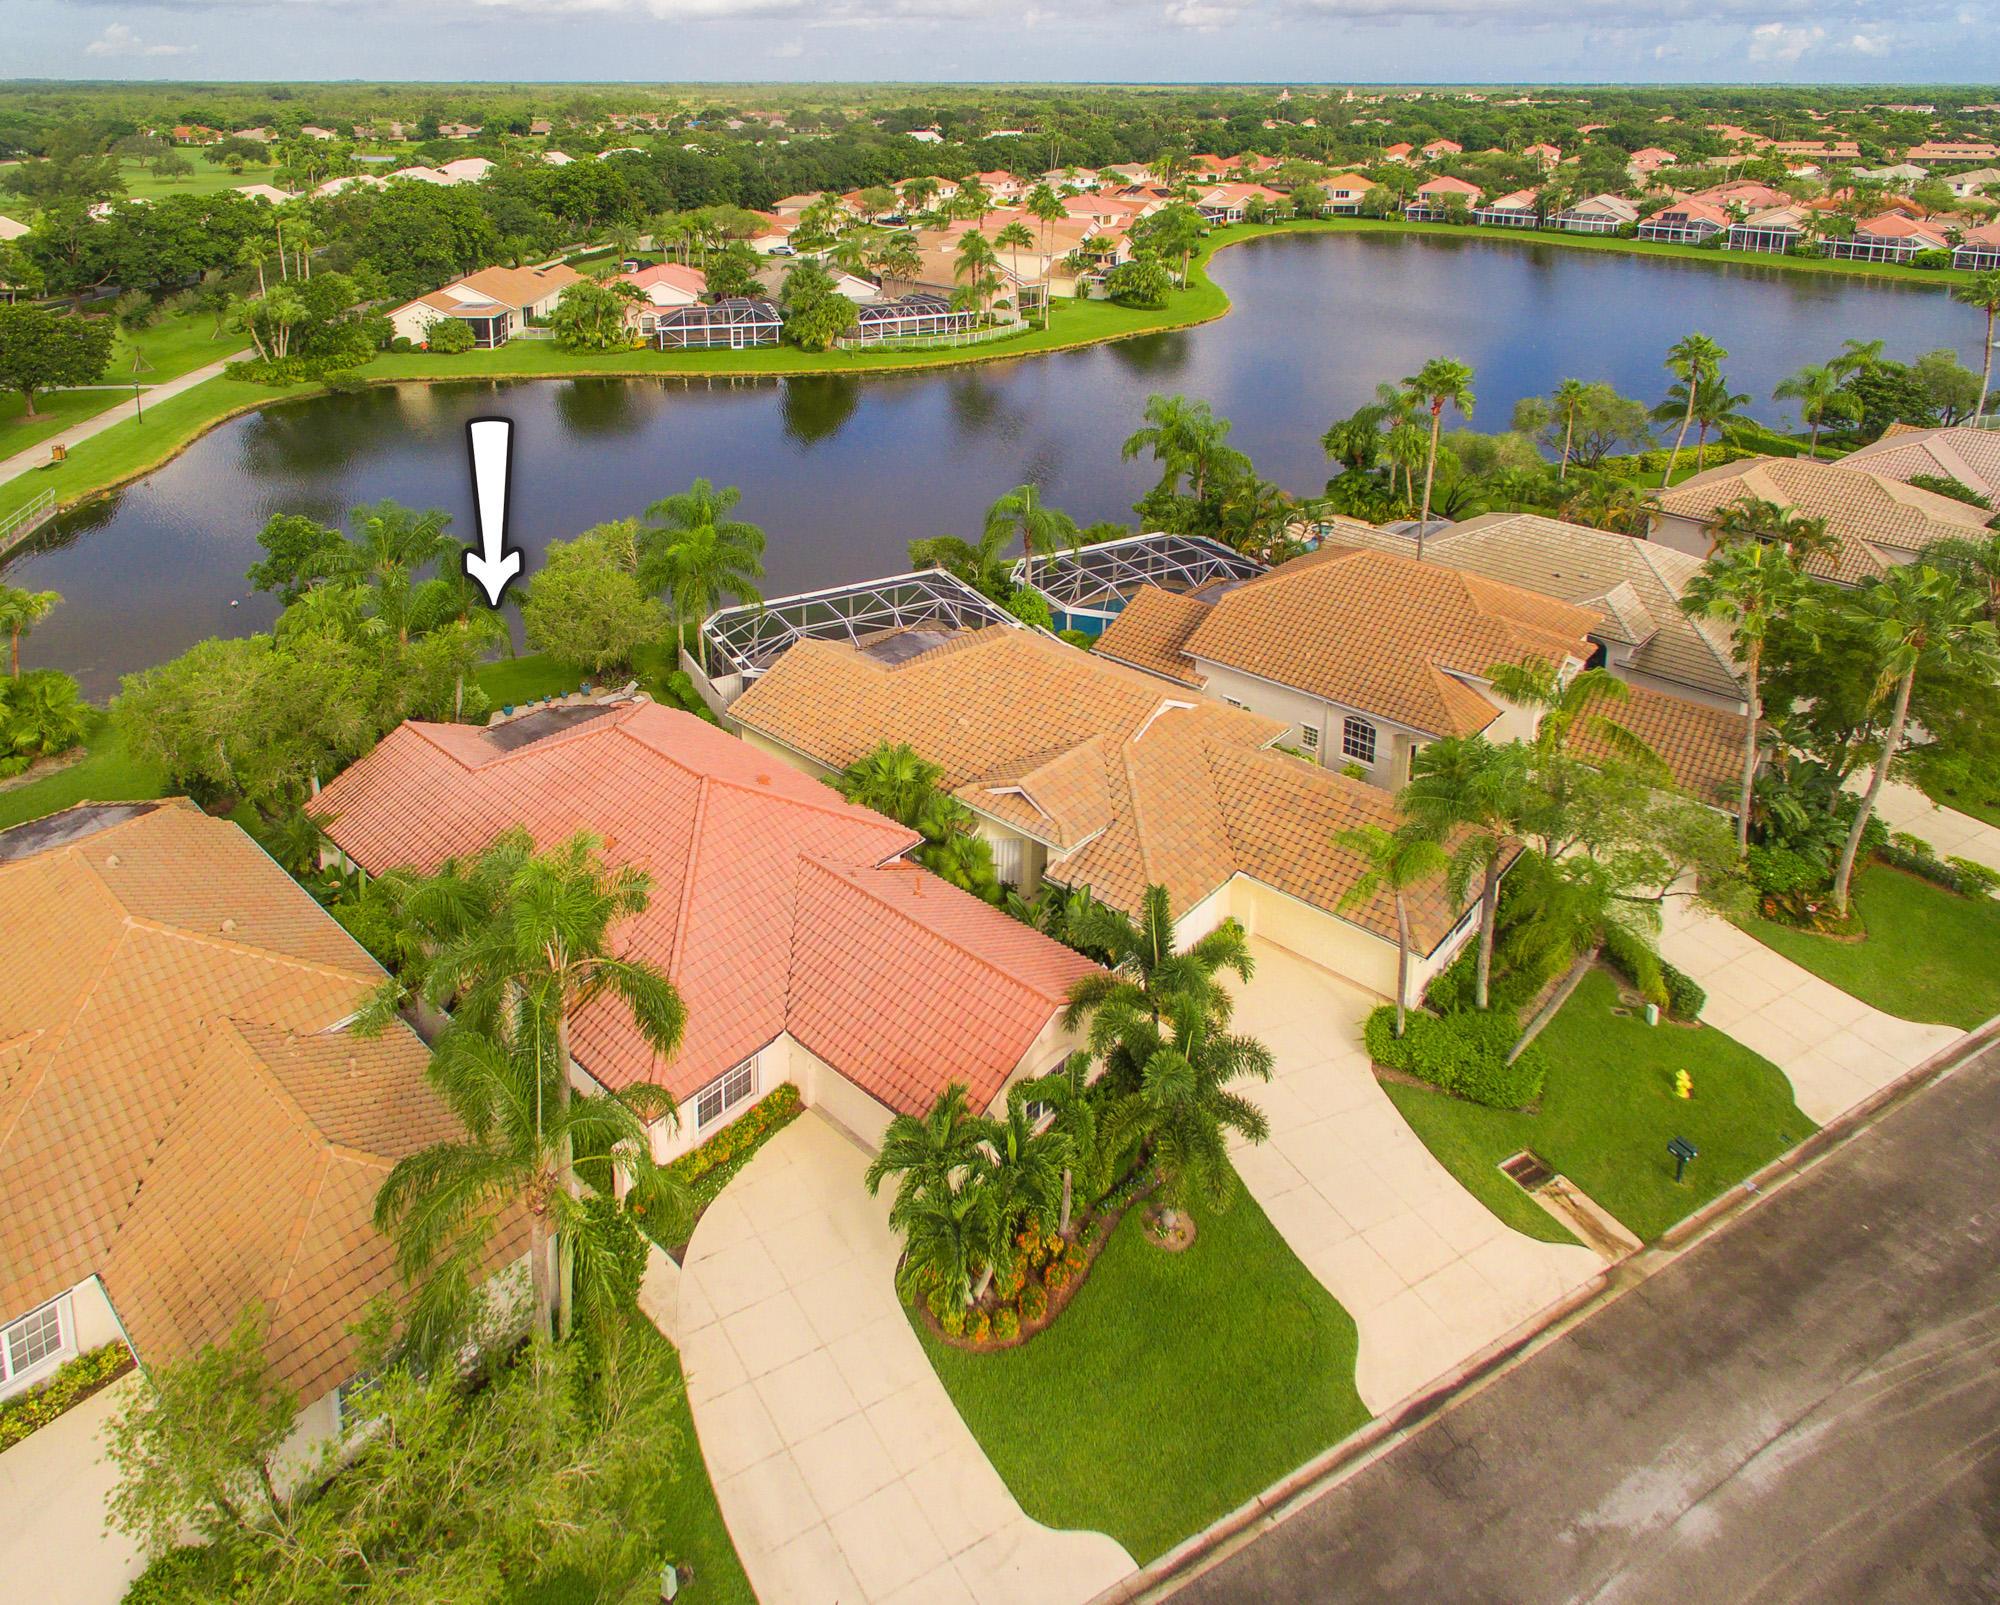 102 Eagleton Lane, Palm Beach Gardens, Florida 33418, 3 Bedrooms Bedrooms, ,2 BathroomsBathrooms,A,Single family,Eagleton,RX-10469280